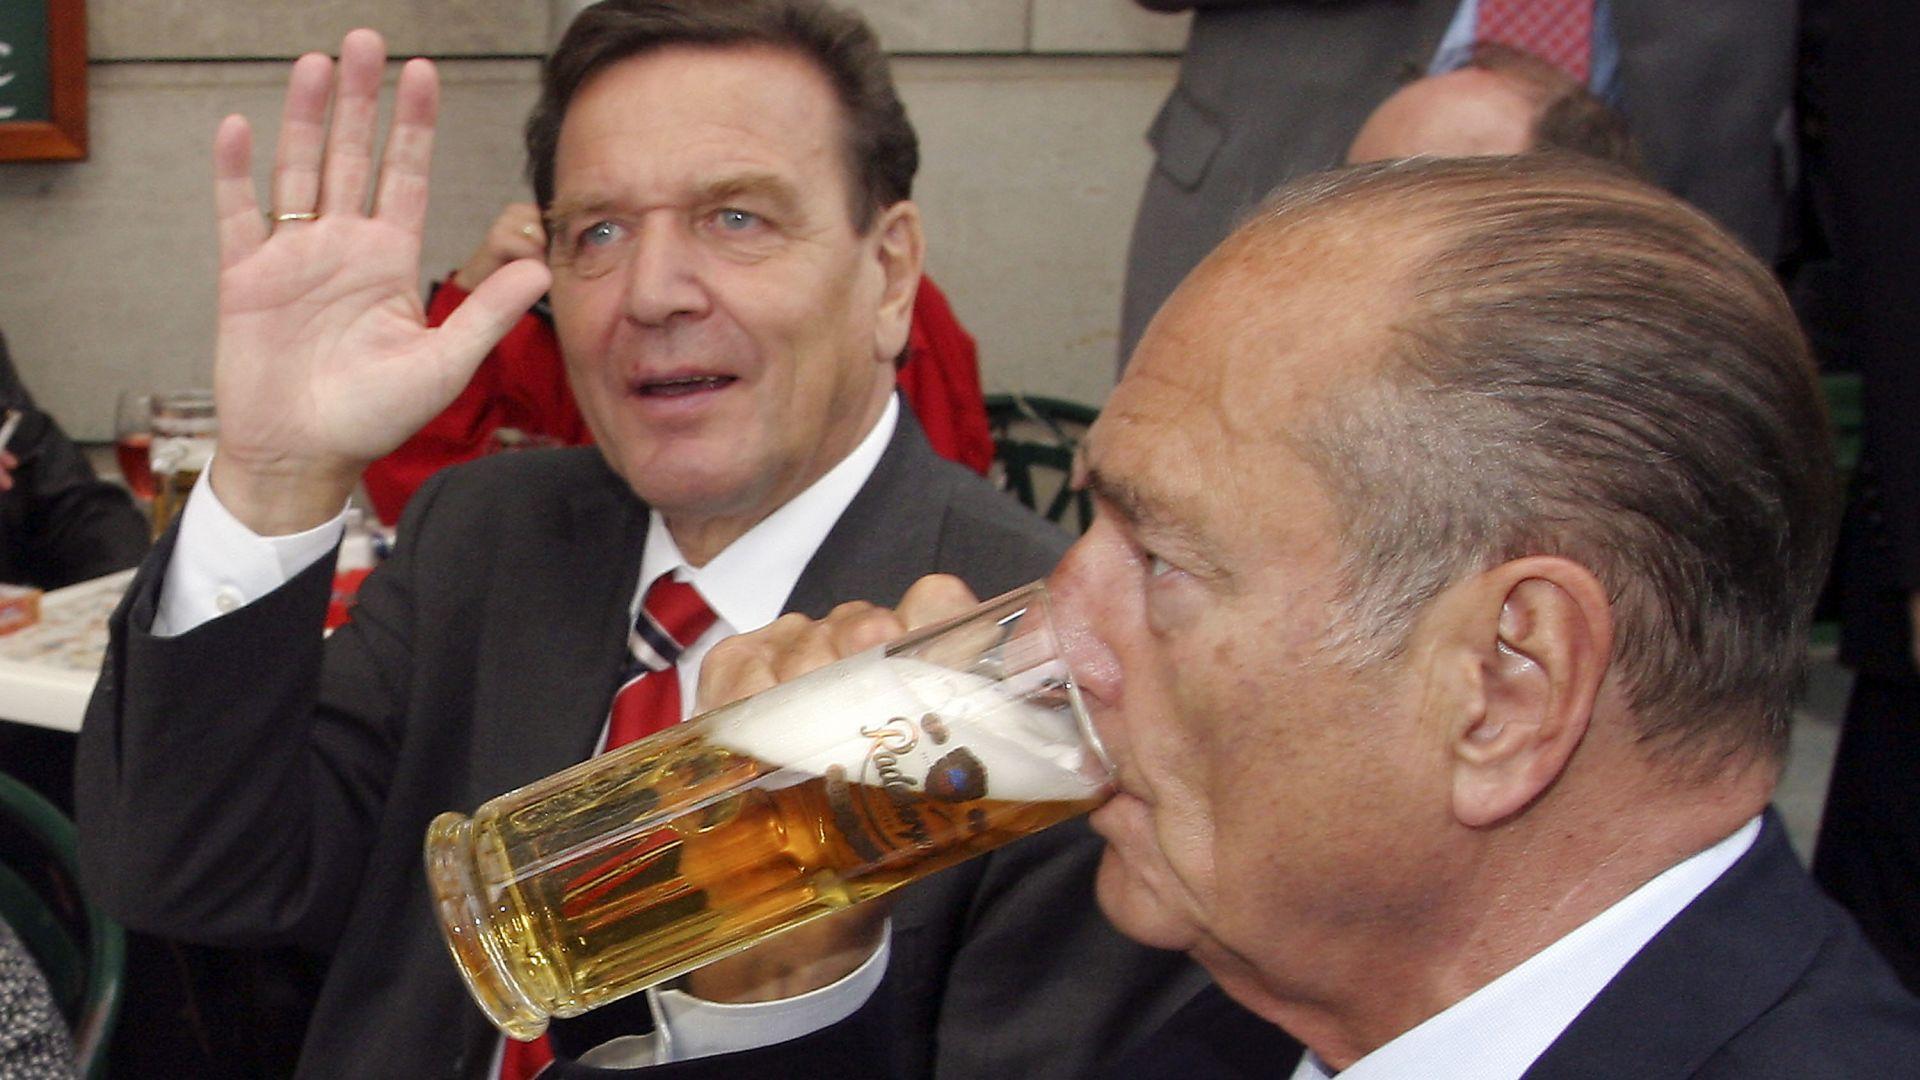 Ширак поддържа топли контакти с управляващия Германия, Шрьодер - 2002 г.